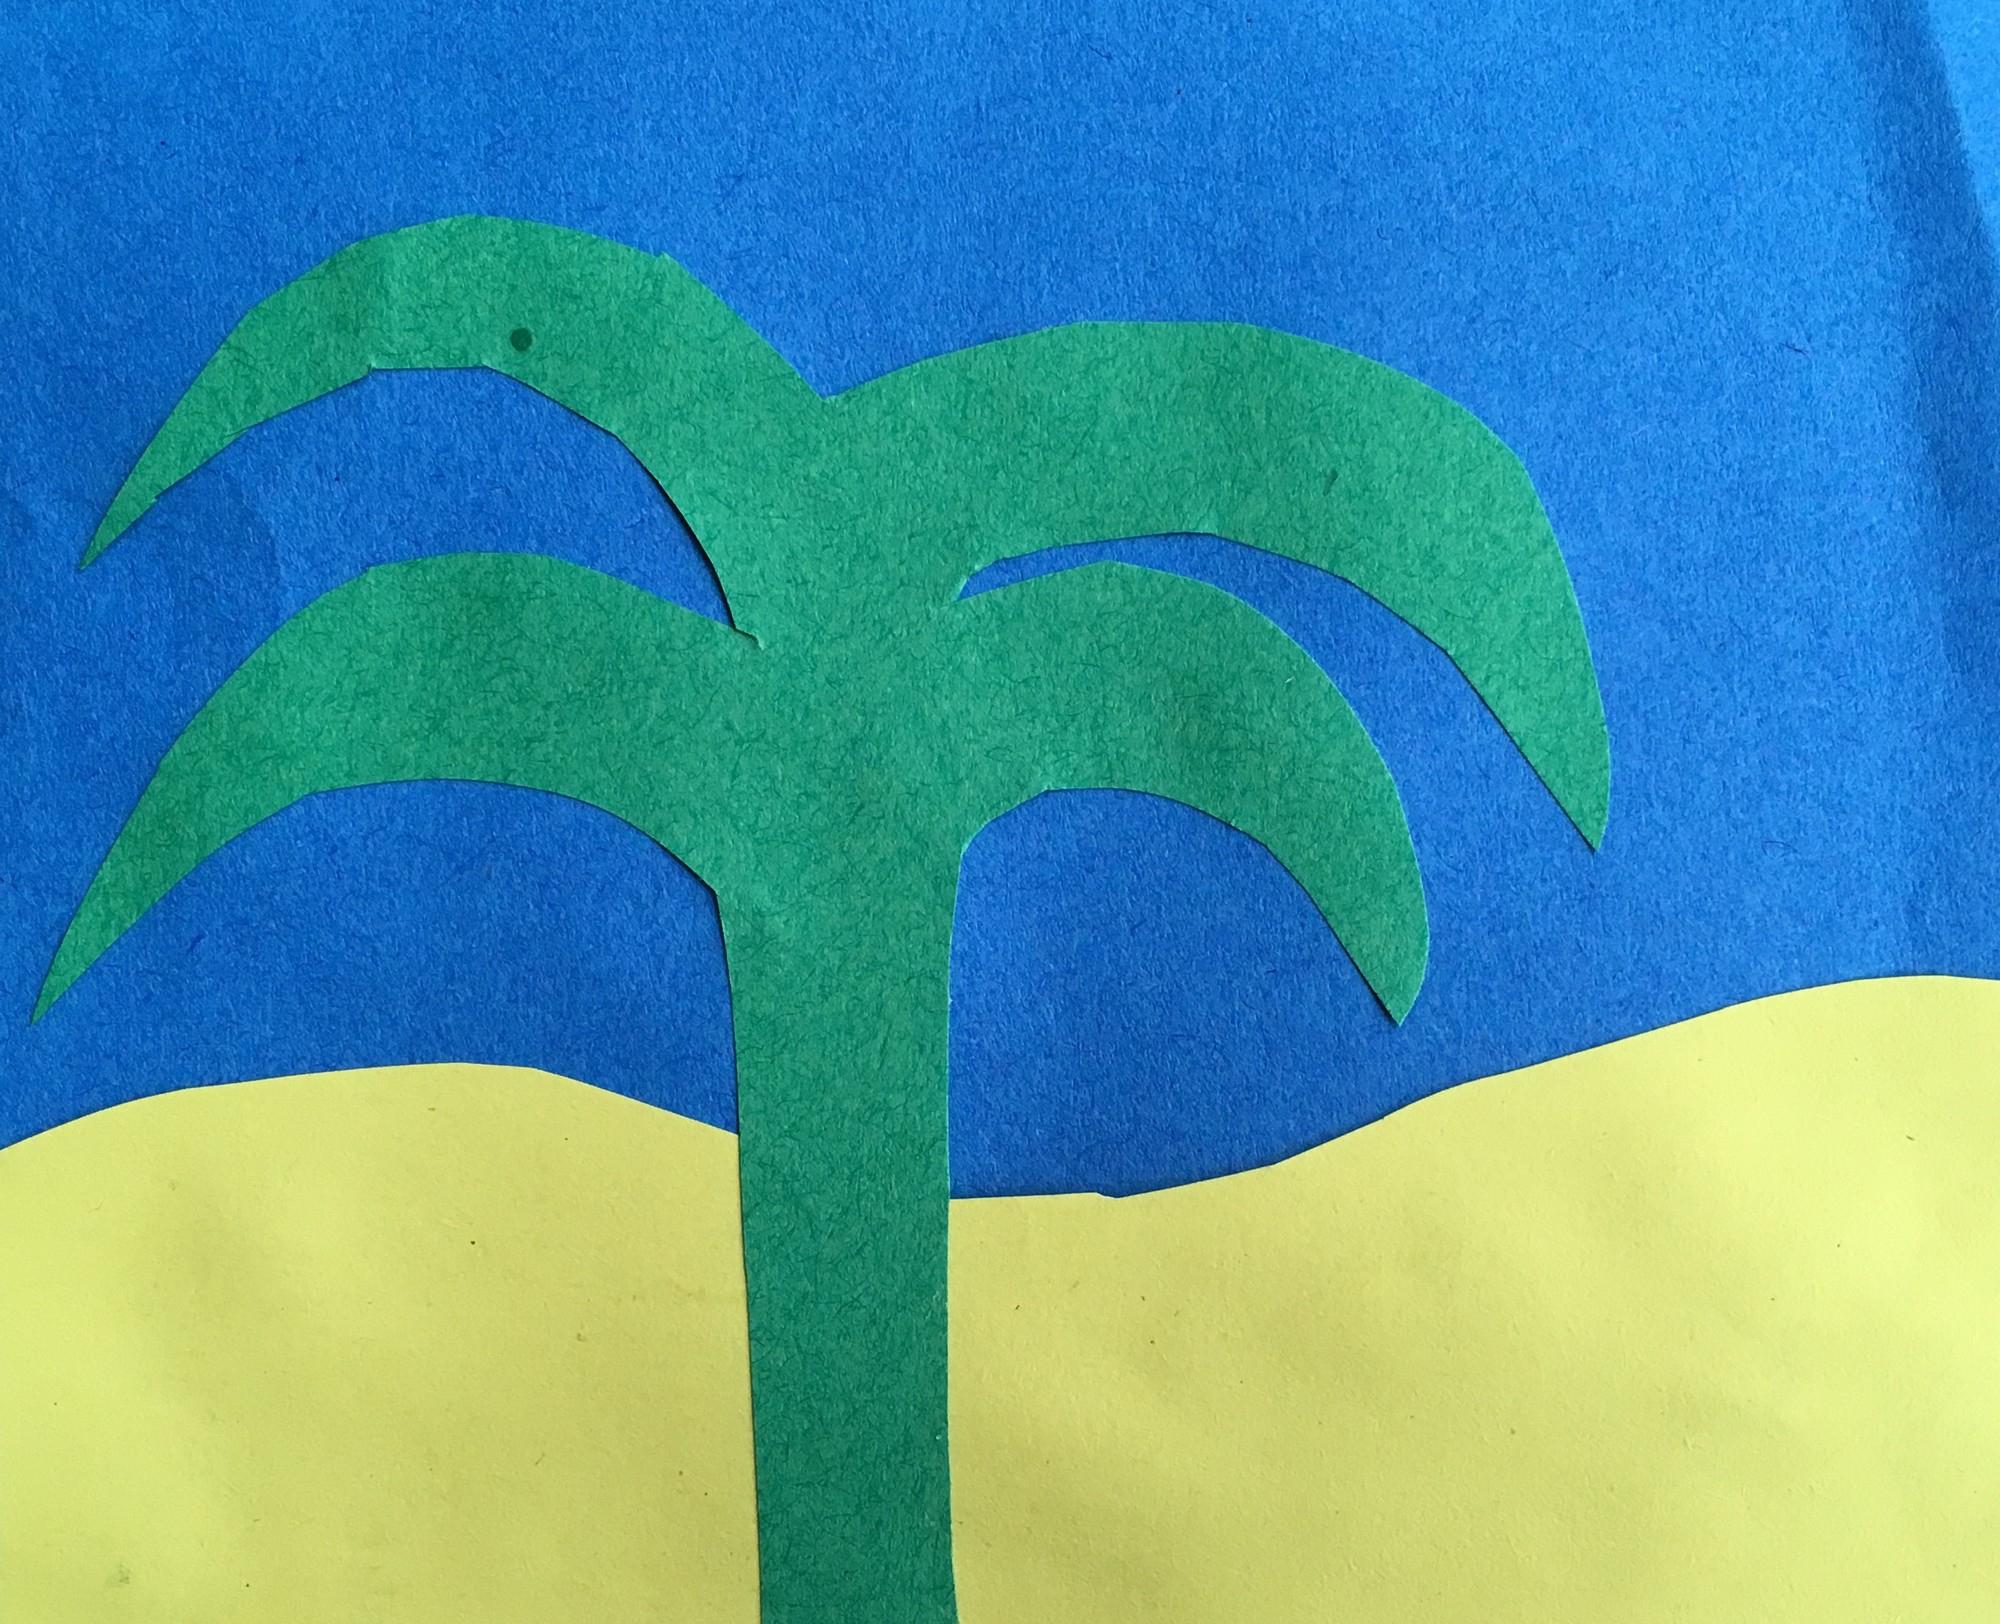 Palmboom knutsel